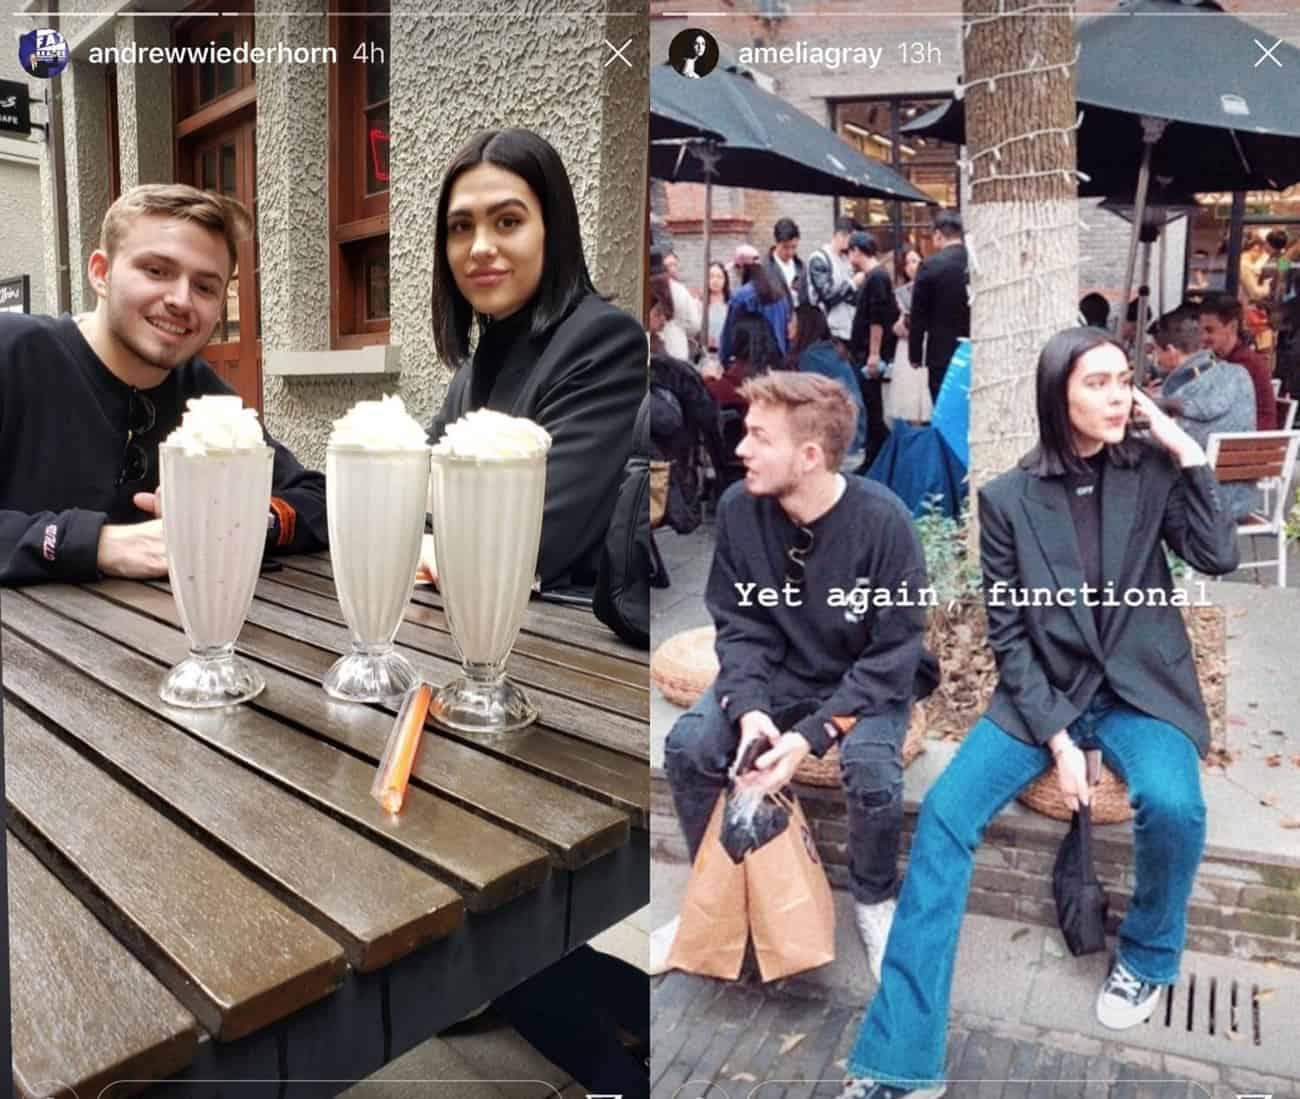 Amelia Gray Hamlin Boyfriend Mercer Wiederhorn